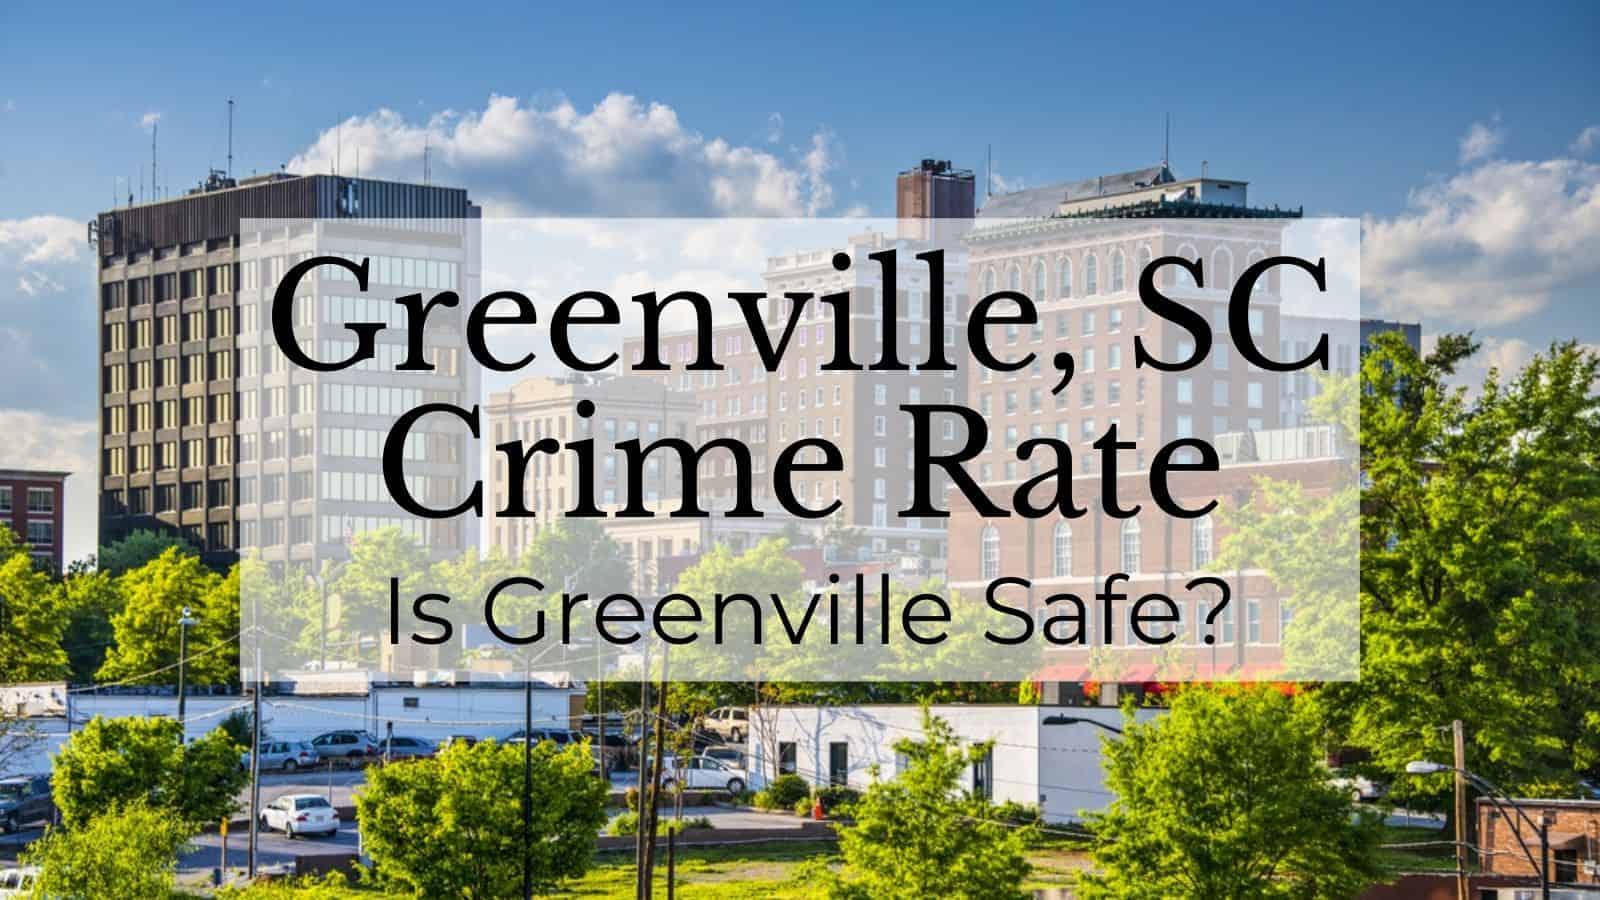 Greenville, SC Crime Rate - Is Greenville Safe?